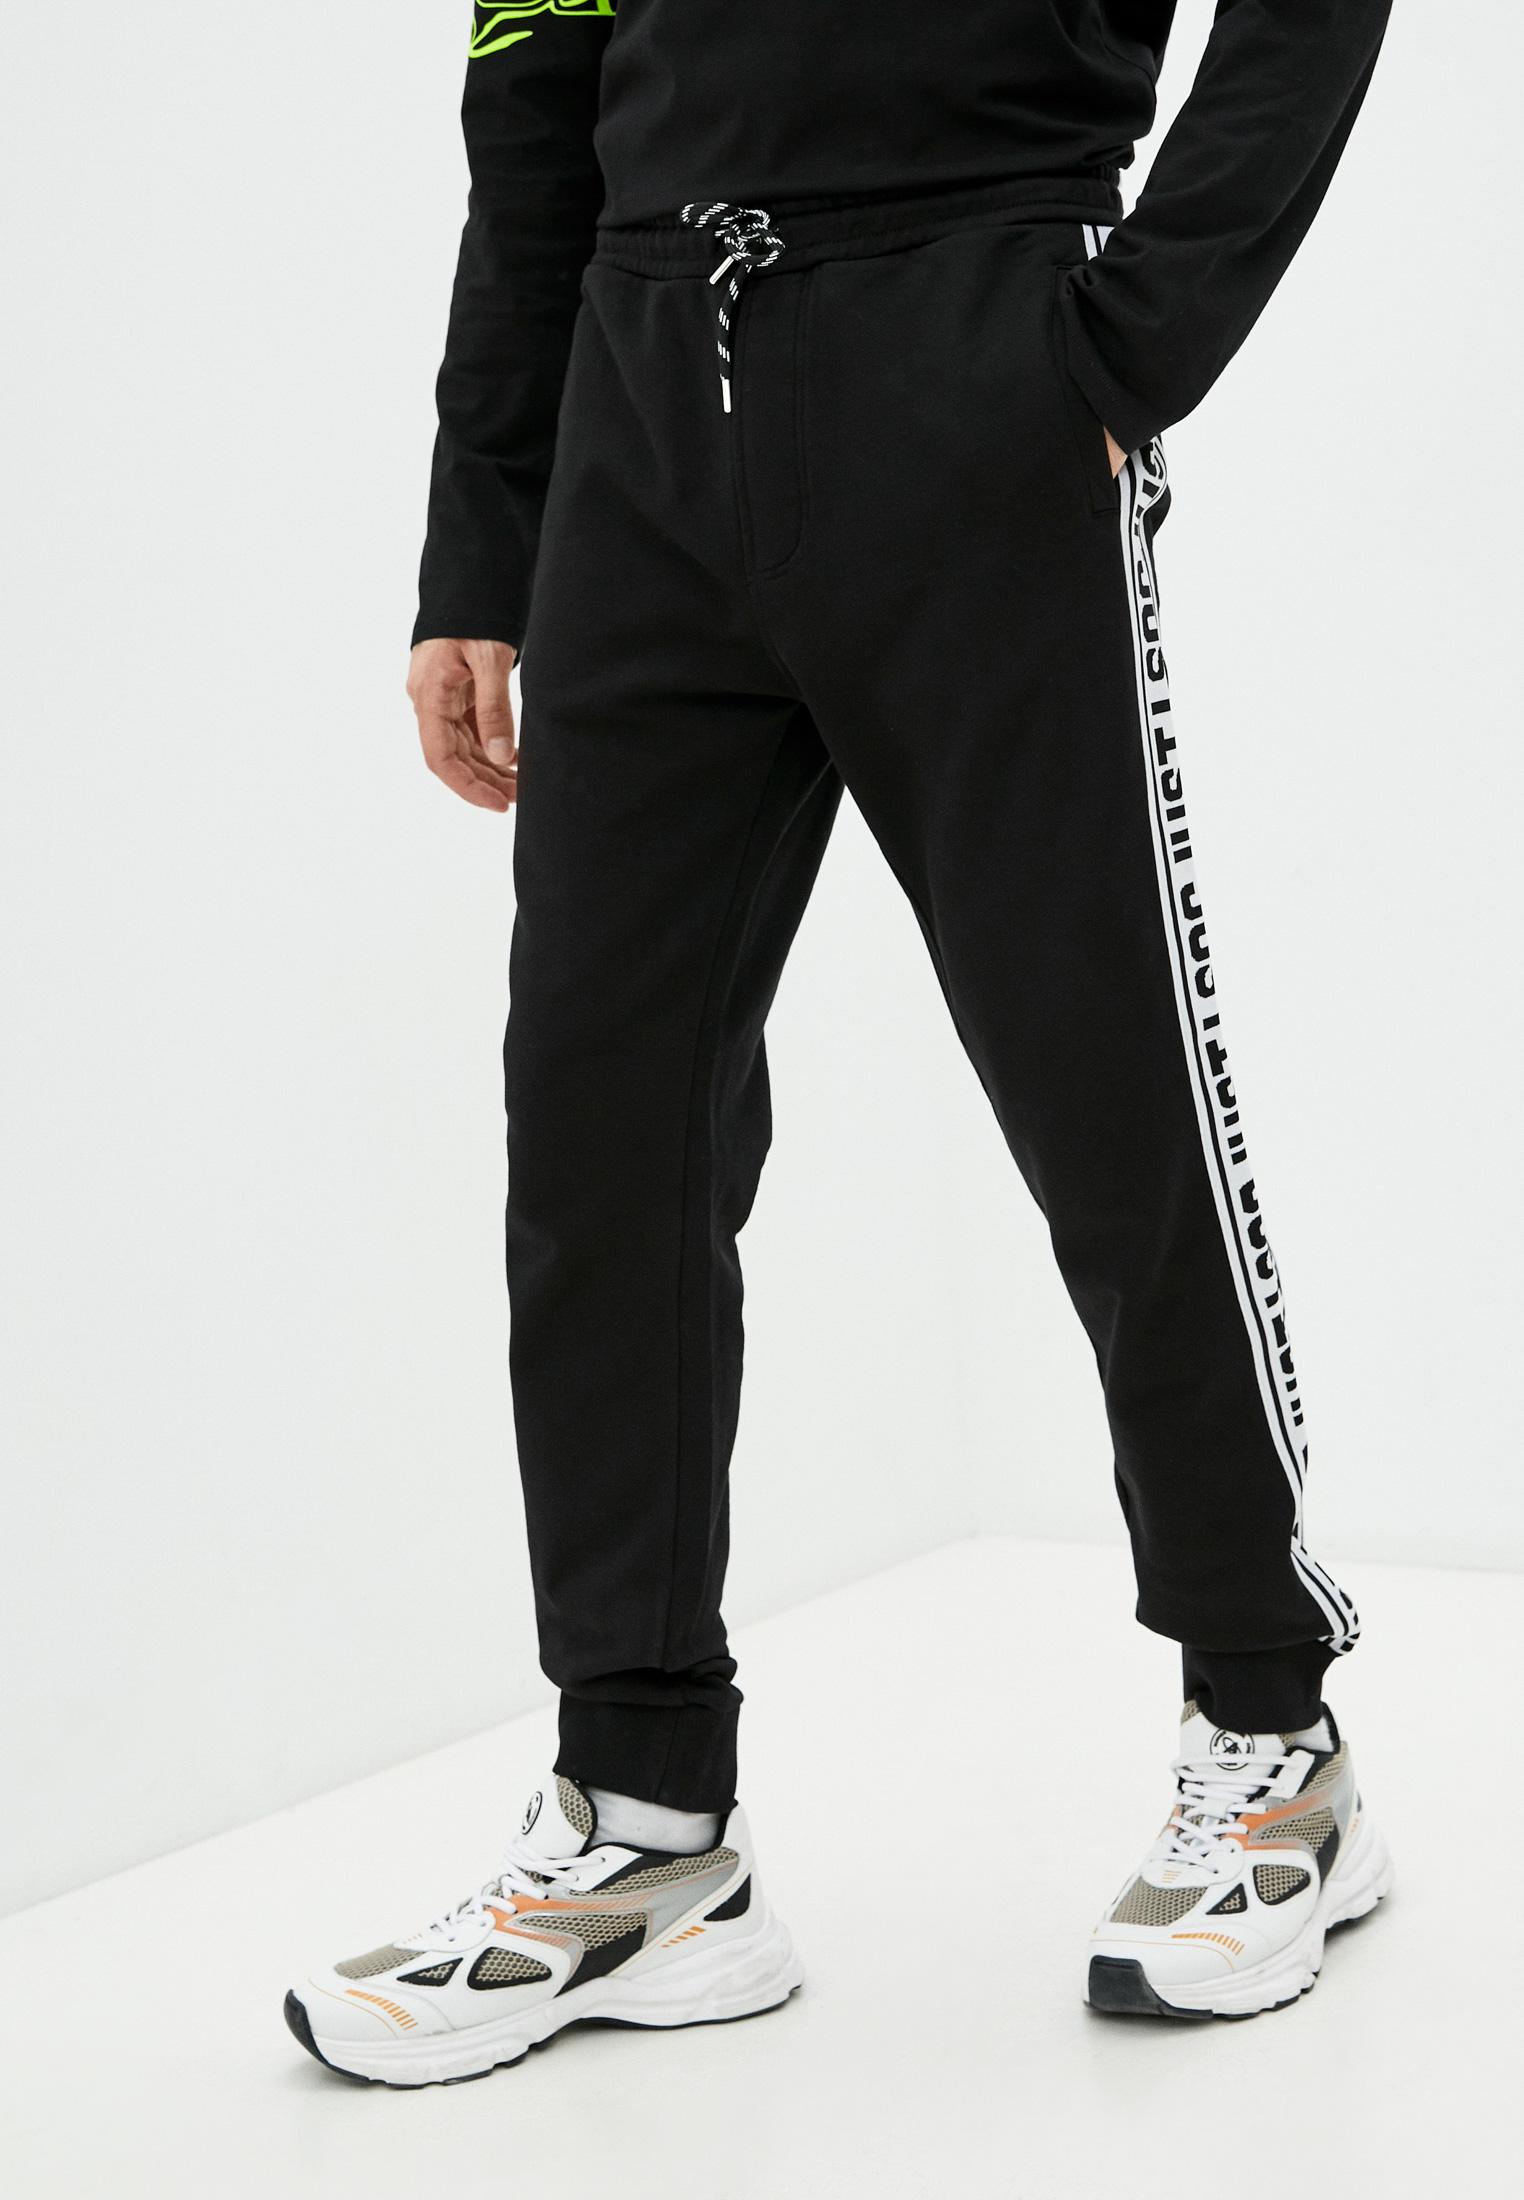 Мужские спортивные брюки Just Cavalli (Джаст Кавалли) S03KA0165 N25189